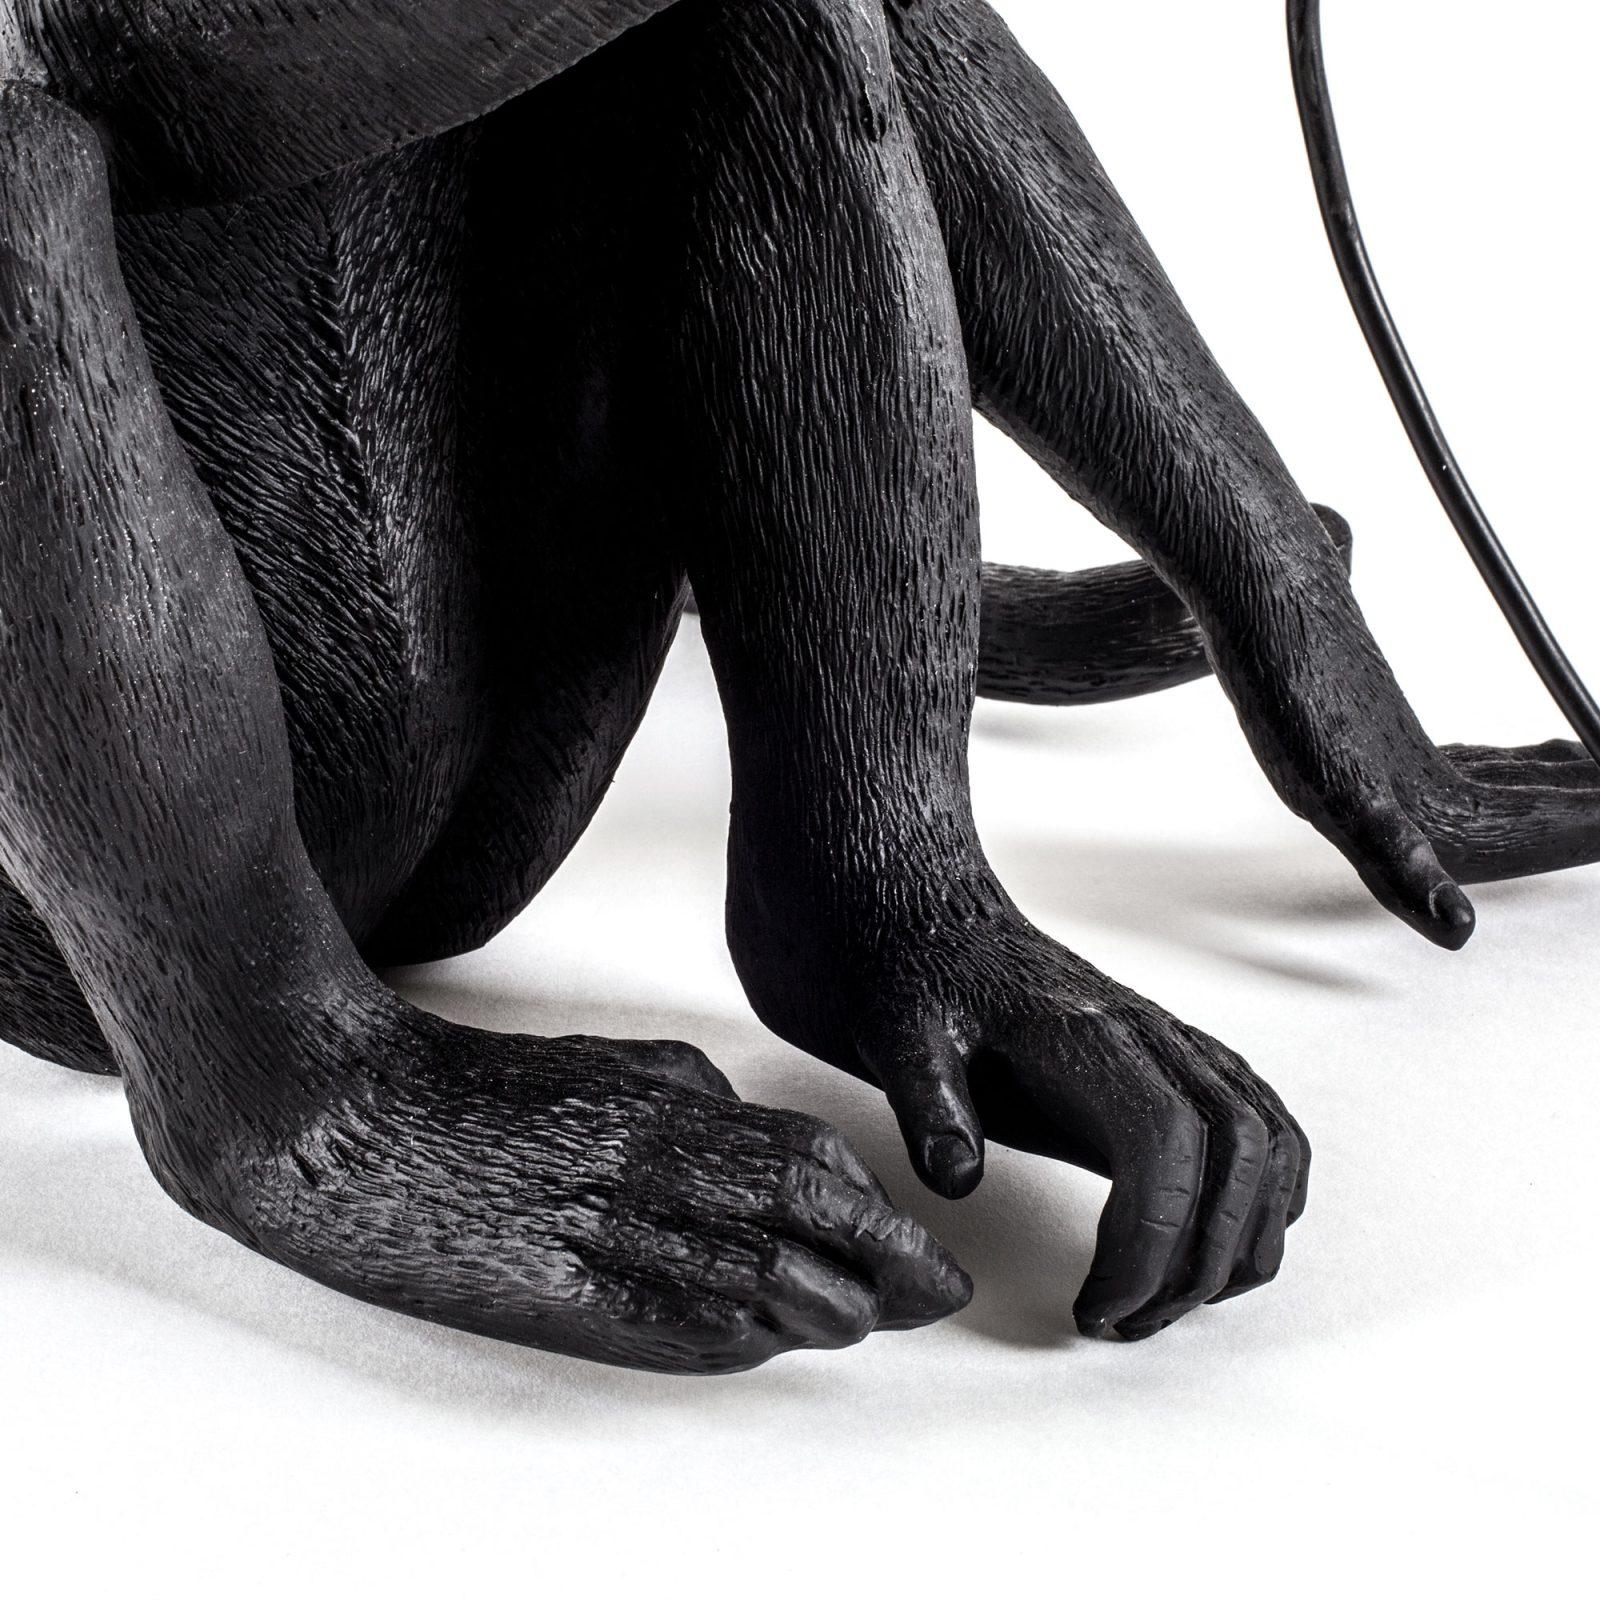 Seletti Outdoor Monkey Lamp, Sitting -31197